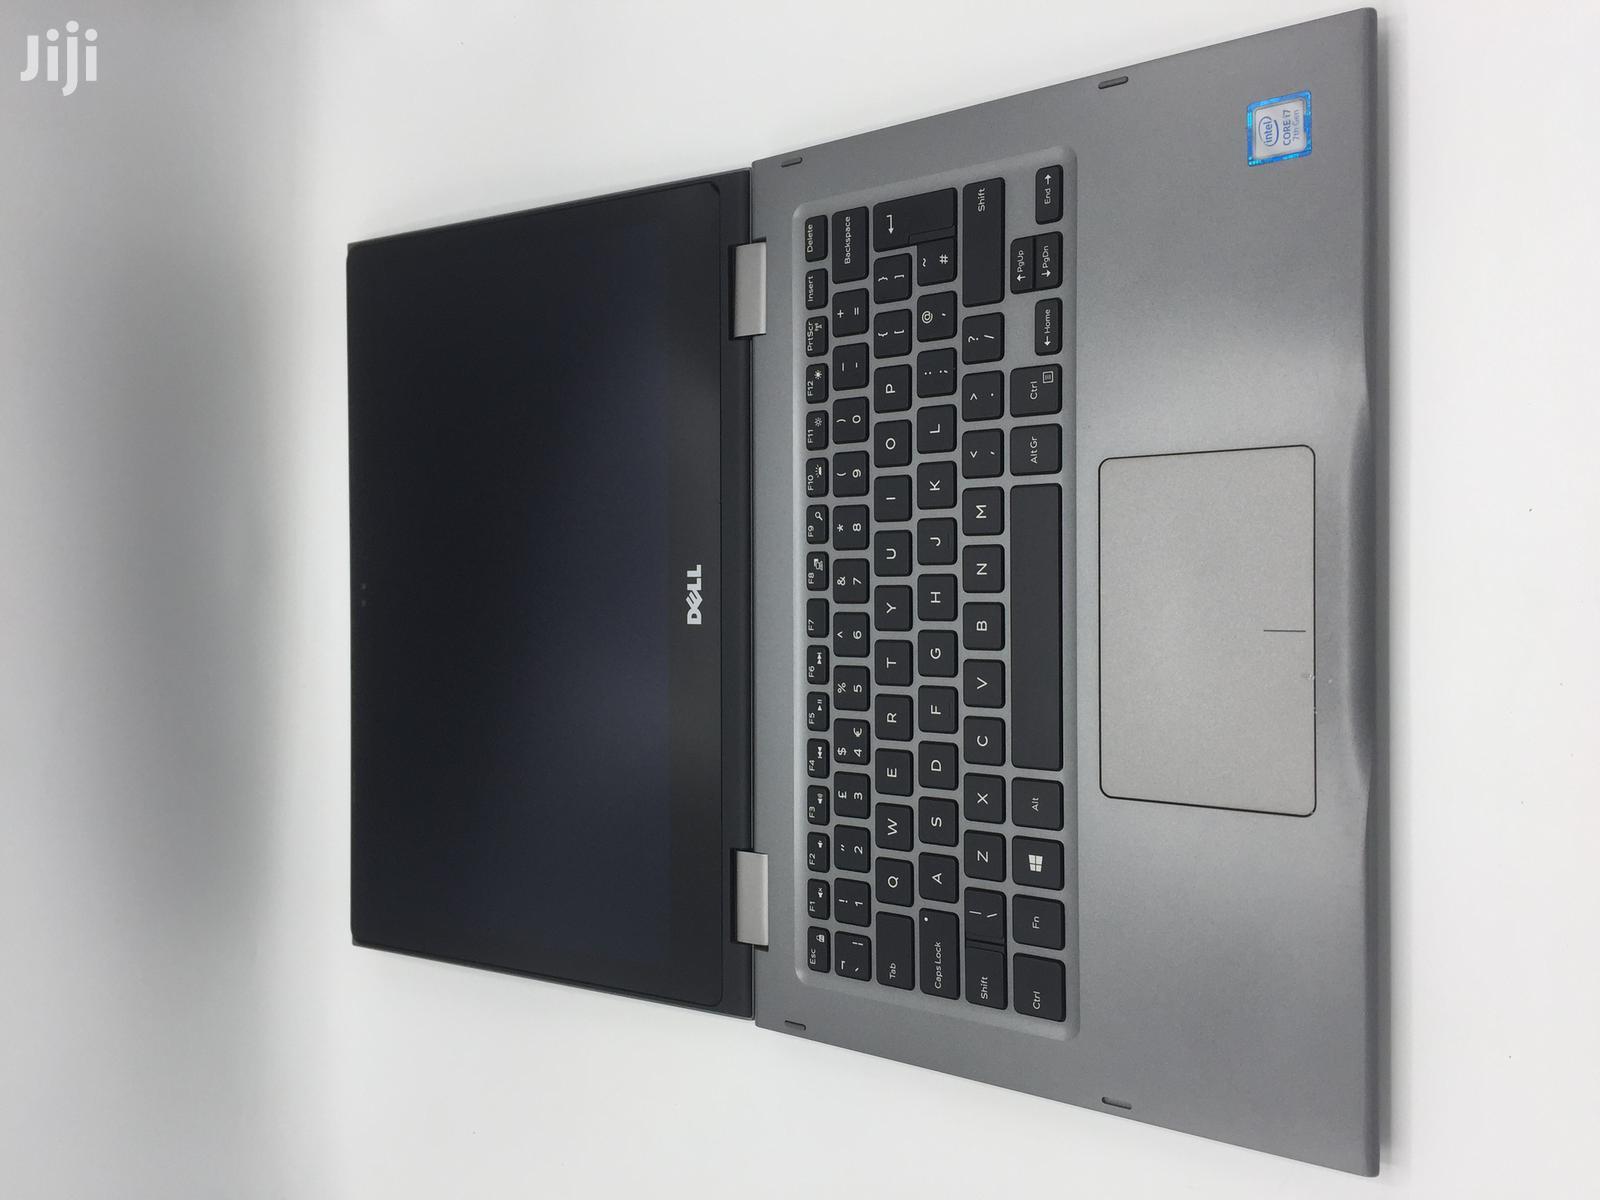 Laptop Dell Inspiron 13 7348 8GB Intel Core I7 SSHD (Hybrid) 500GB   Laptops & Computers for sale in Kampala, Central Region, Uganda